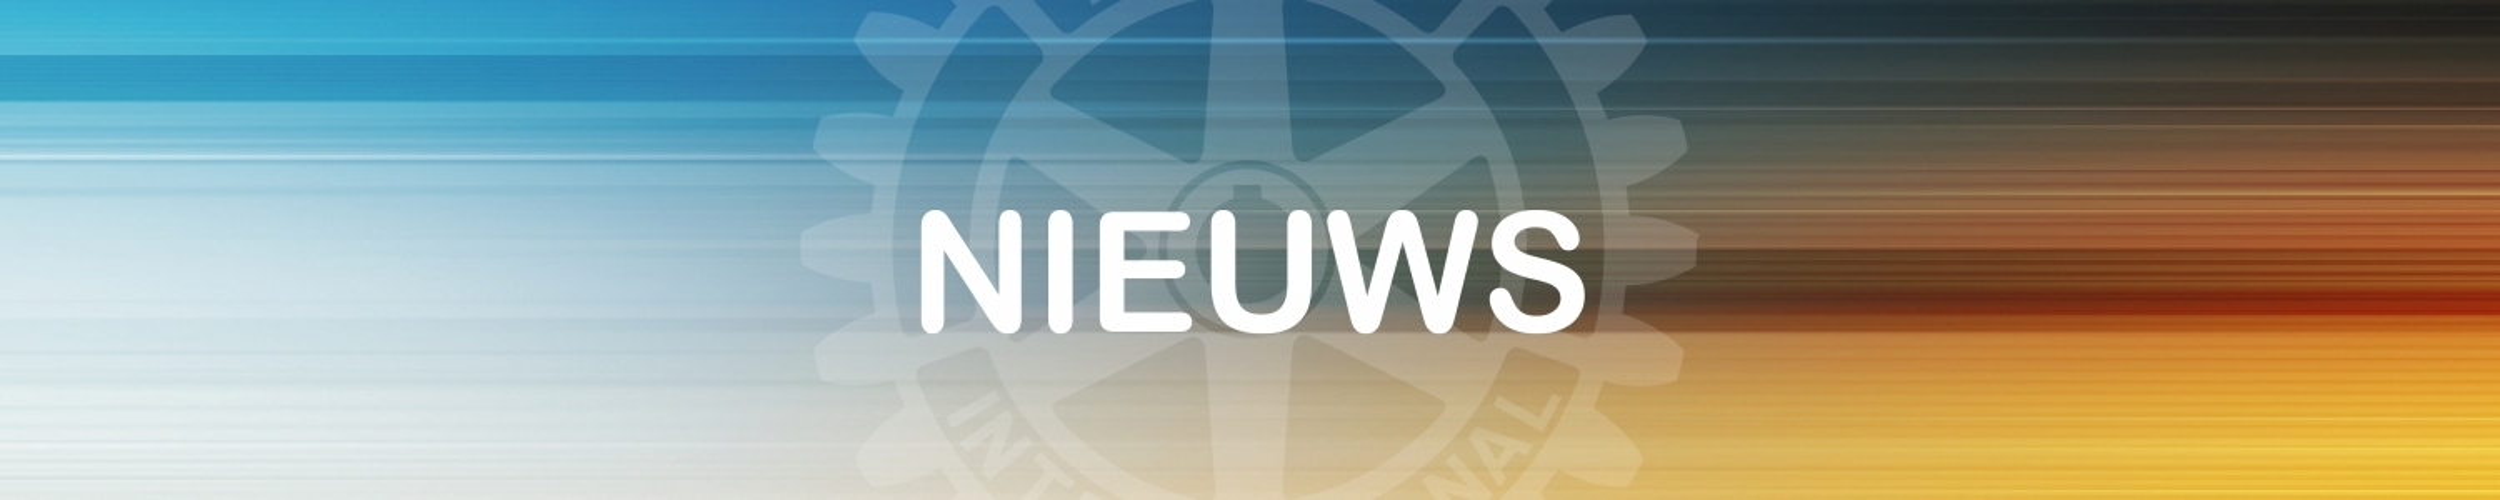 Nieuws Rotary Geel